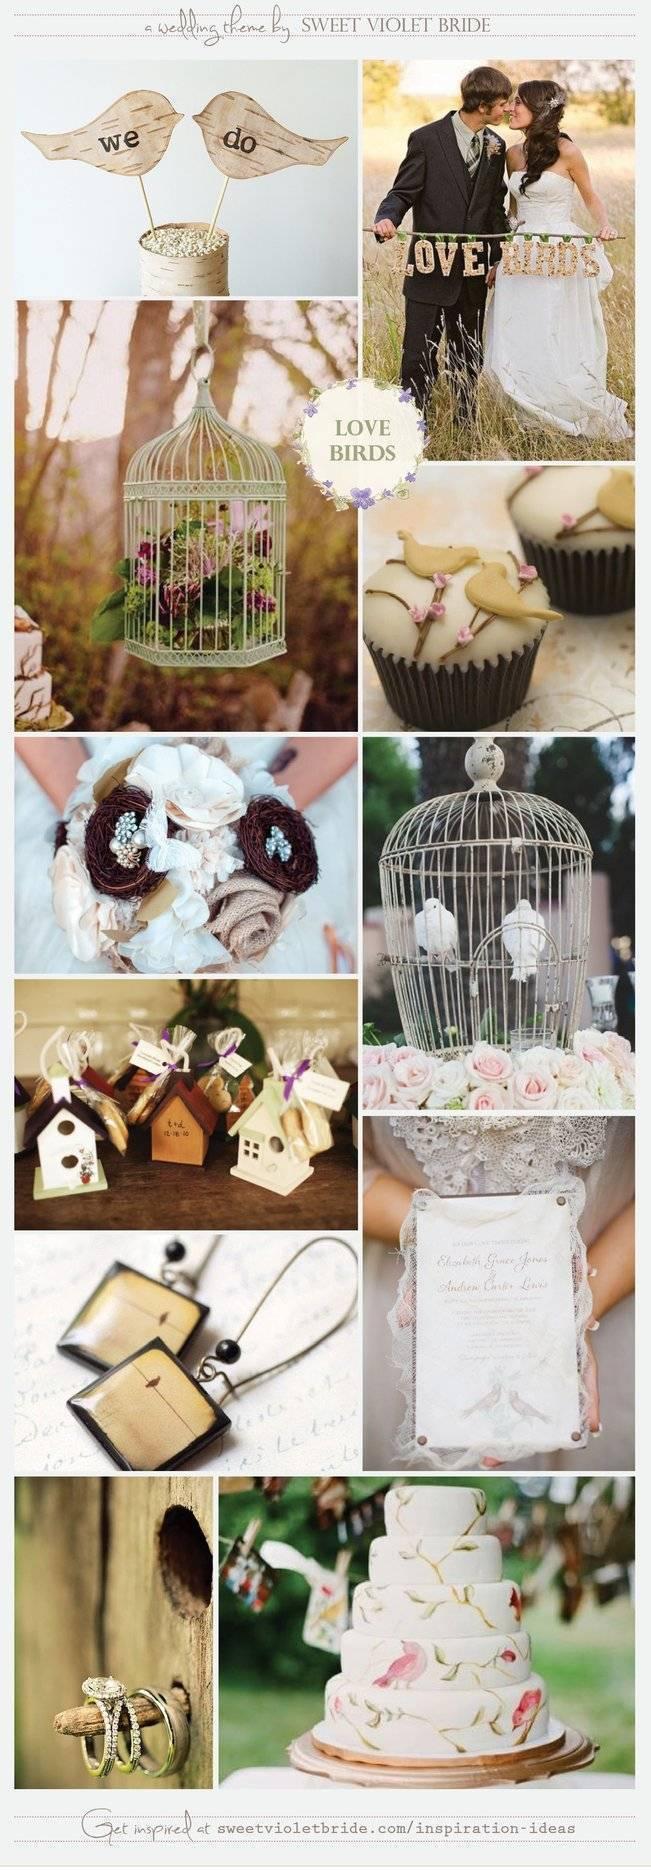 Wedding Inspiration Board #13: Love Birds